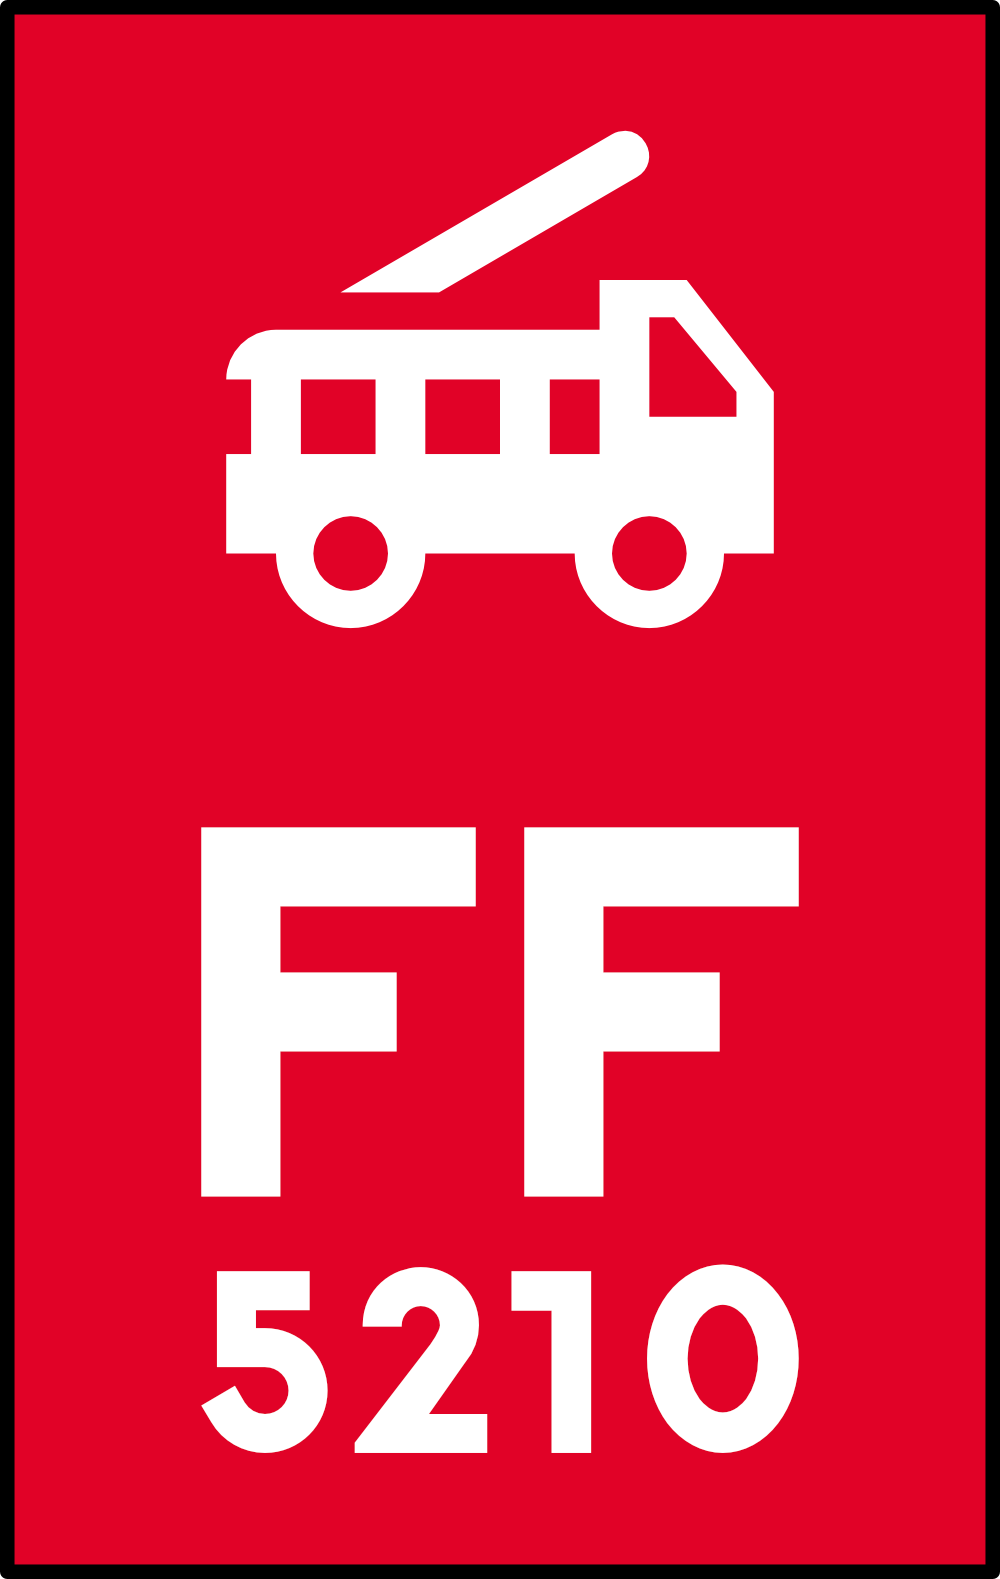 FF Rudow